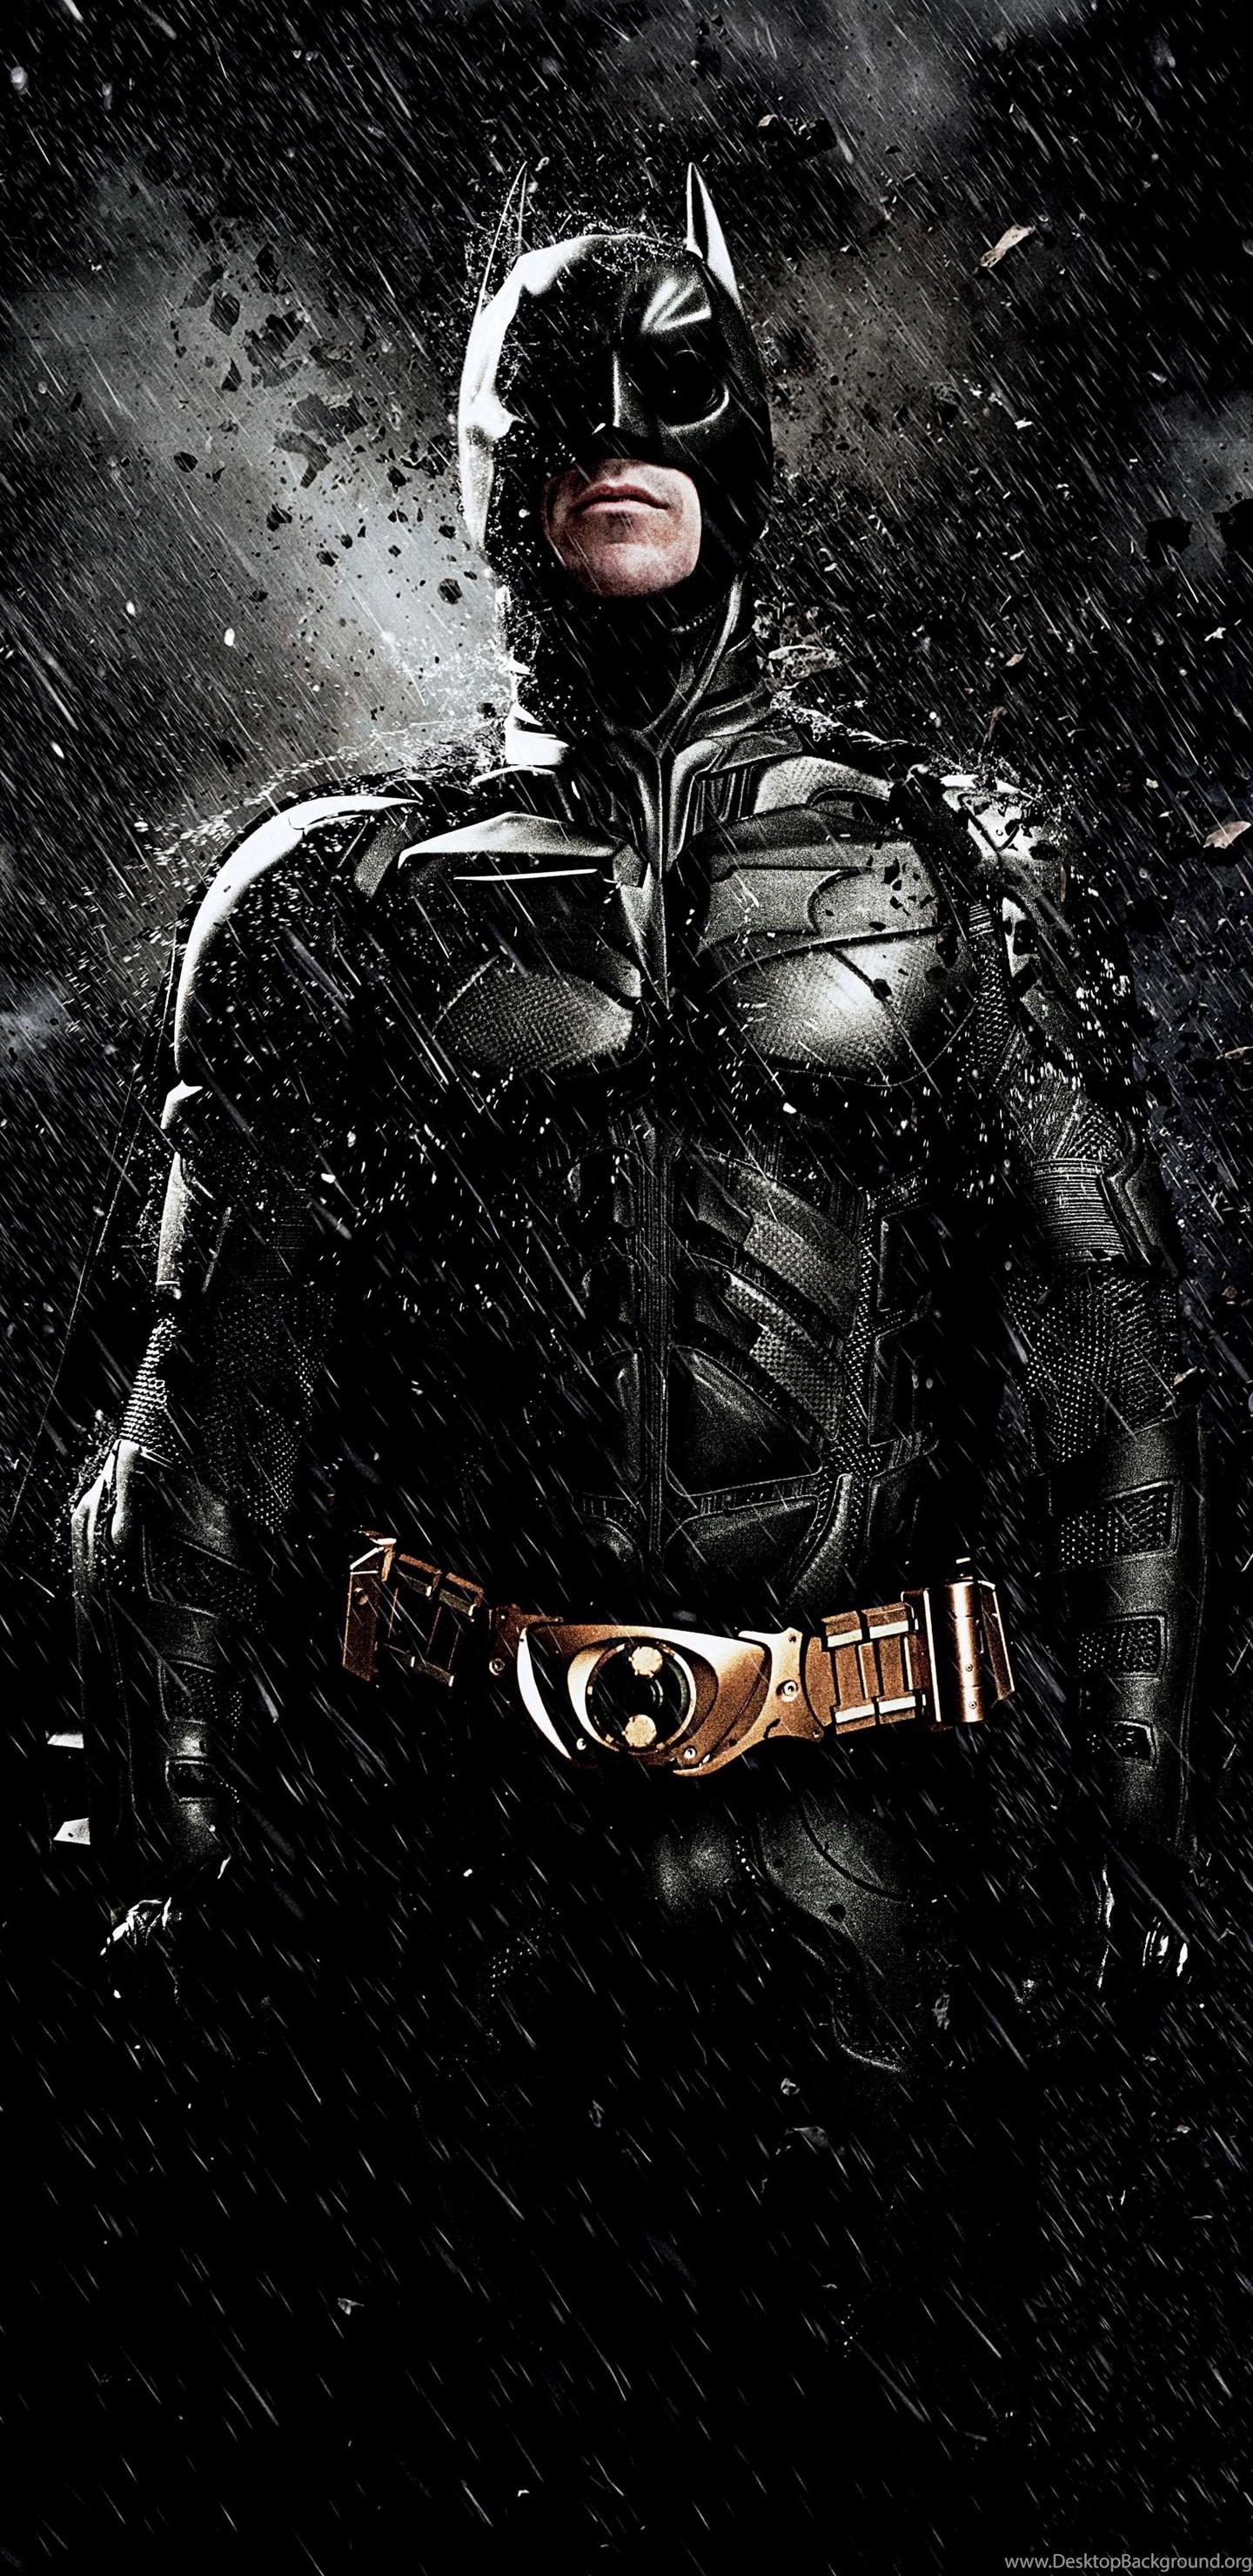 Batman Artwork Rise Batman The Dark Knight Rises Wallpapers Desktop Background